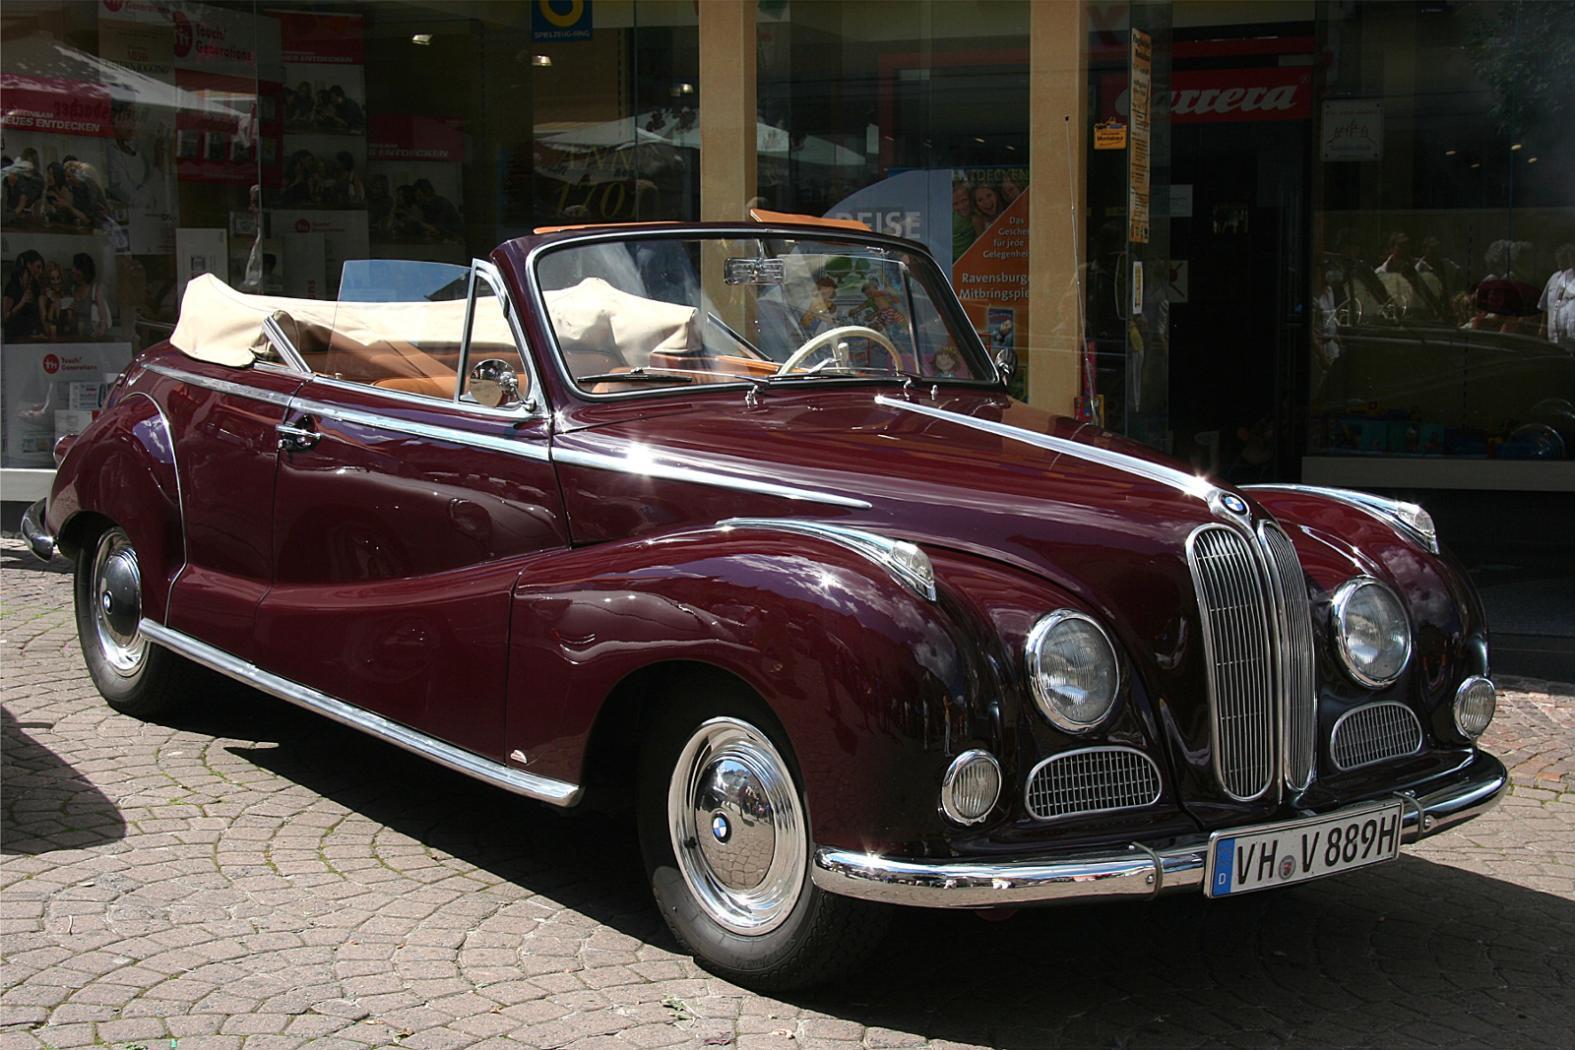 -Moteurs-BMW-six-cylindres-en-ligne-4.jpeg